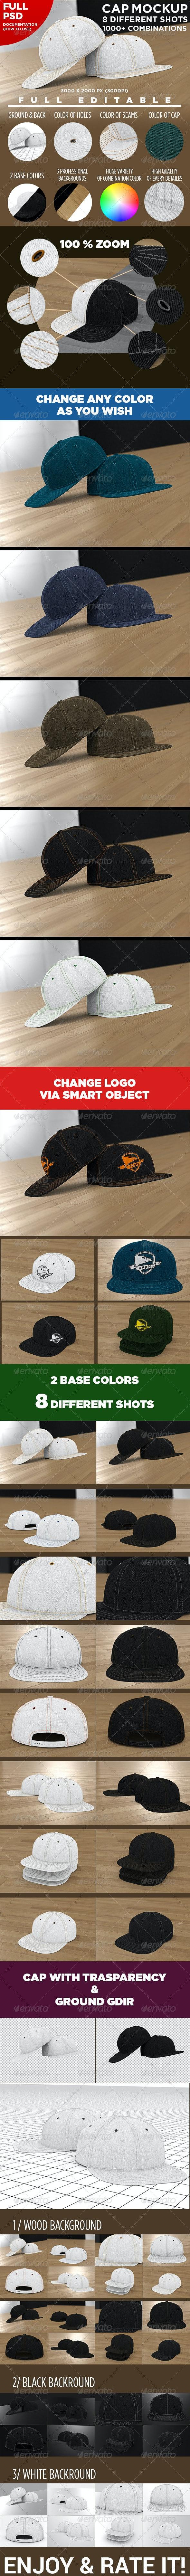 Professional Baseball Cap Mock-up - Miscellaneous Apparel